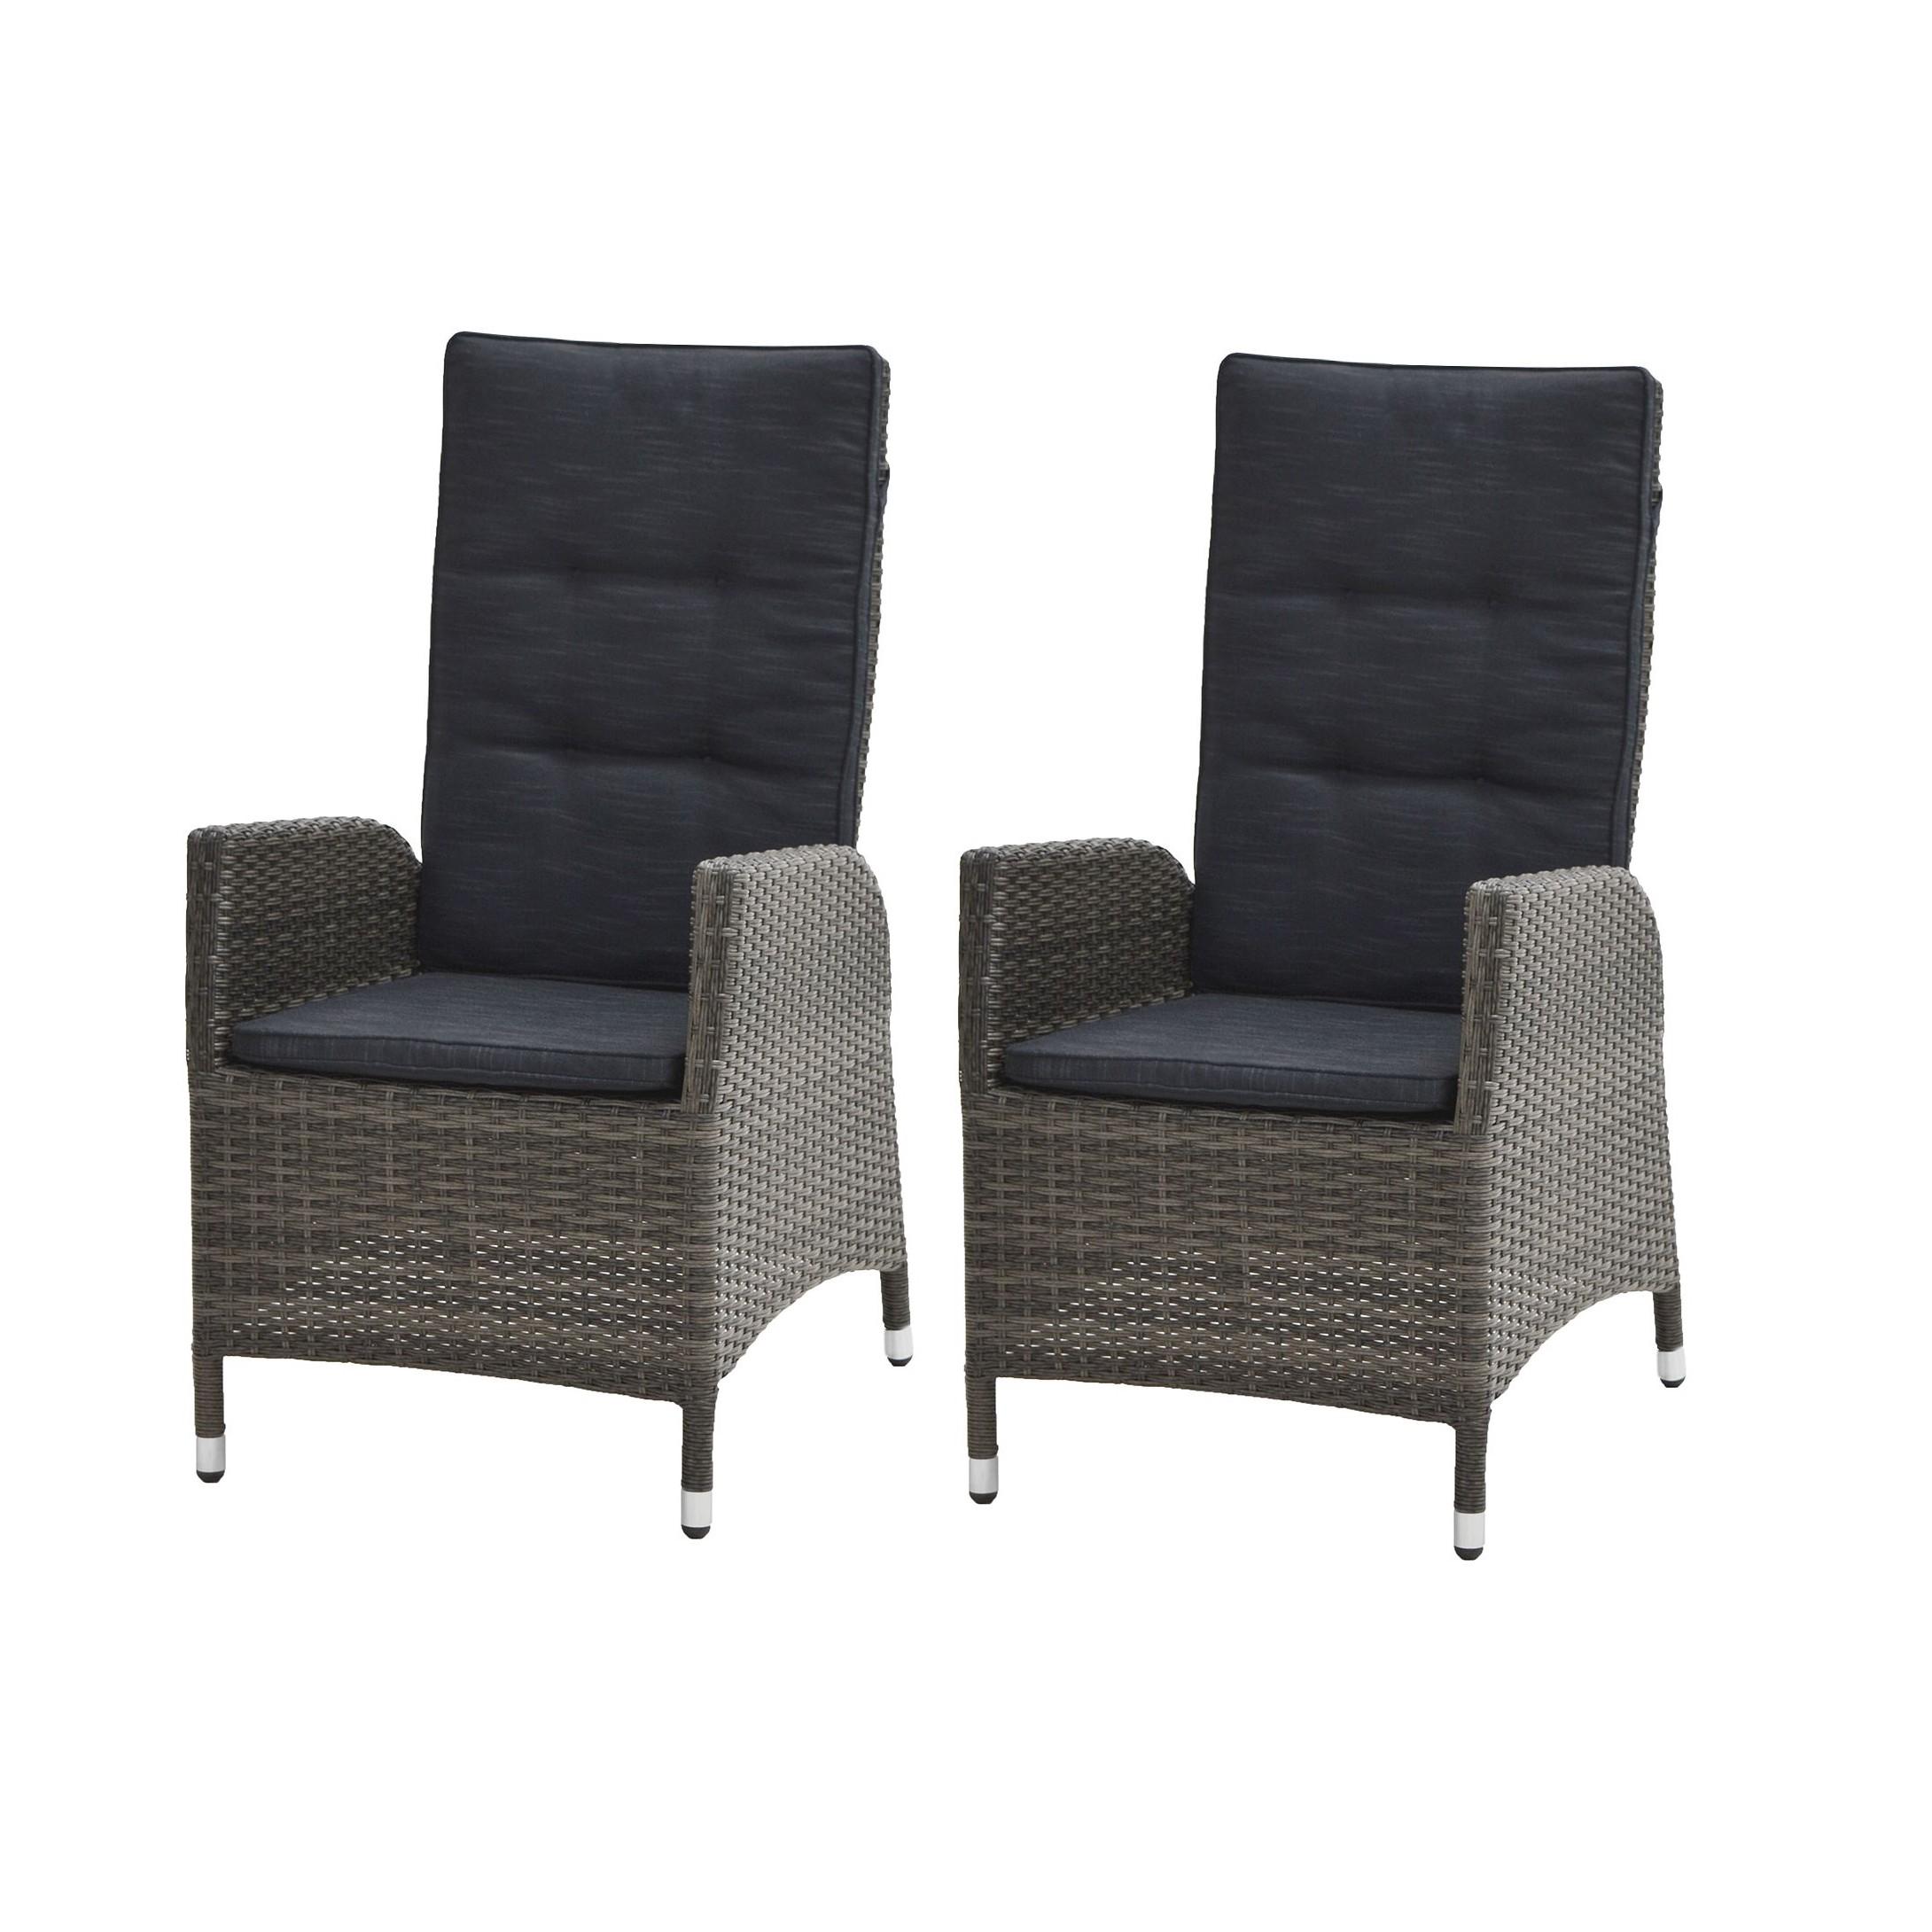 Chaise de jardin Rocking (lot de 2) - Polyrotin / Tissu - Marron gris / Anthracite, Ploß